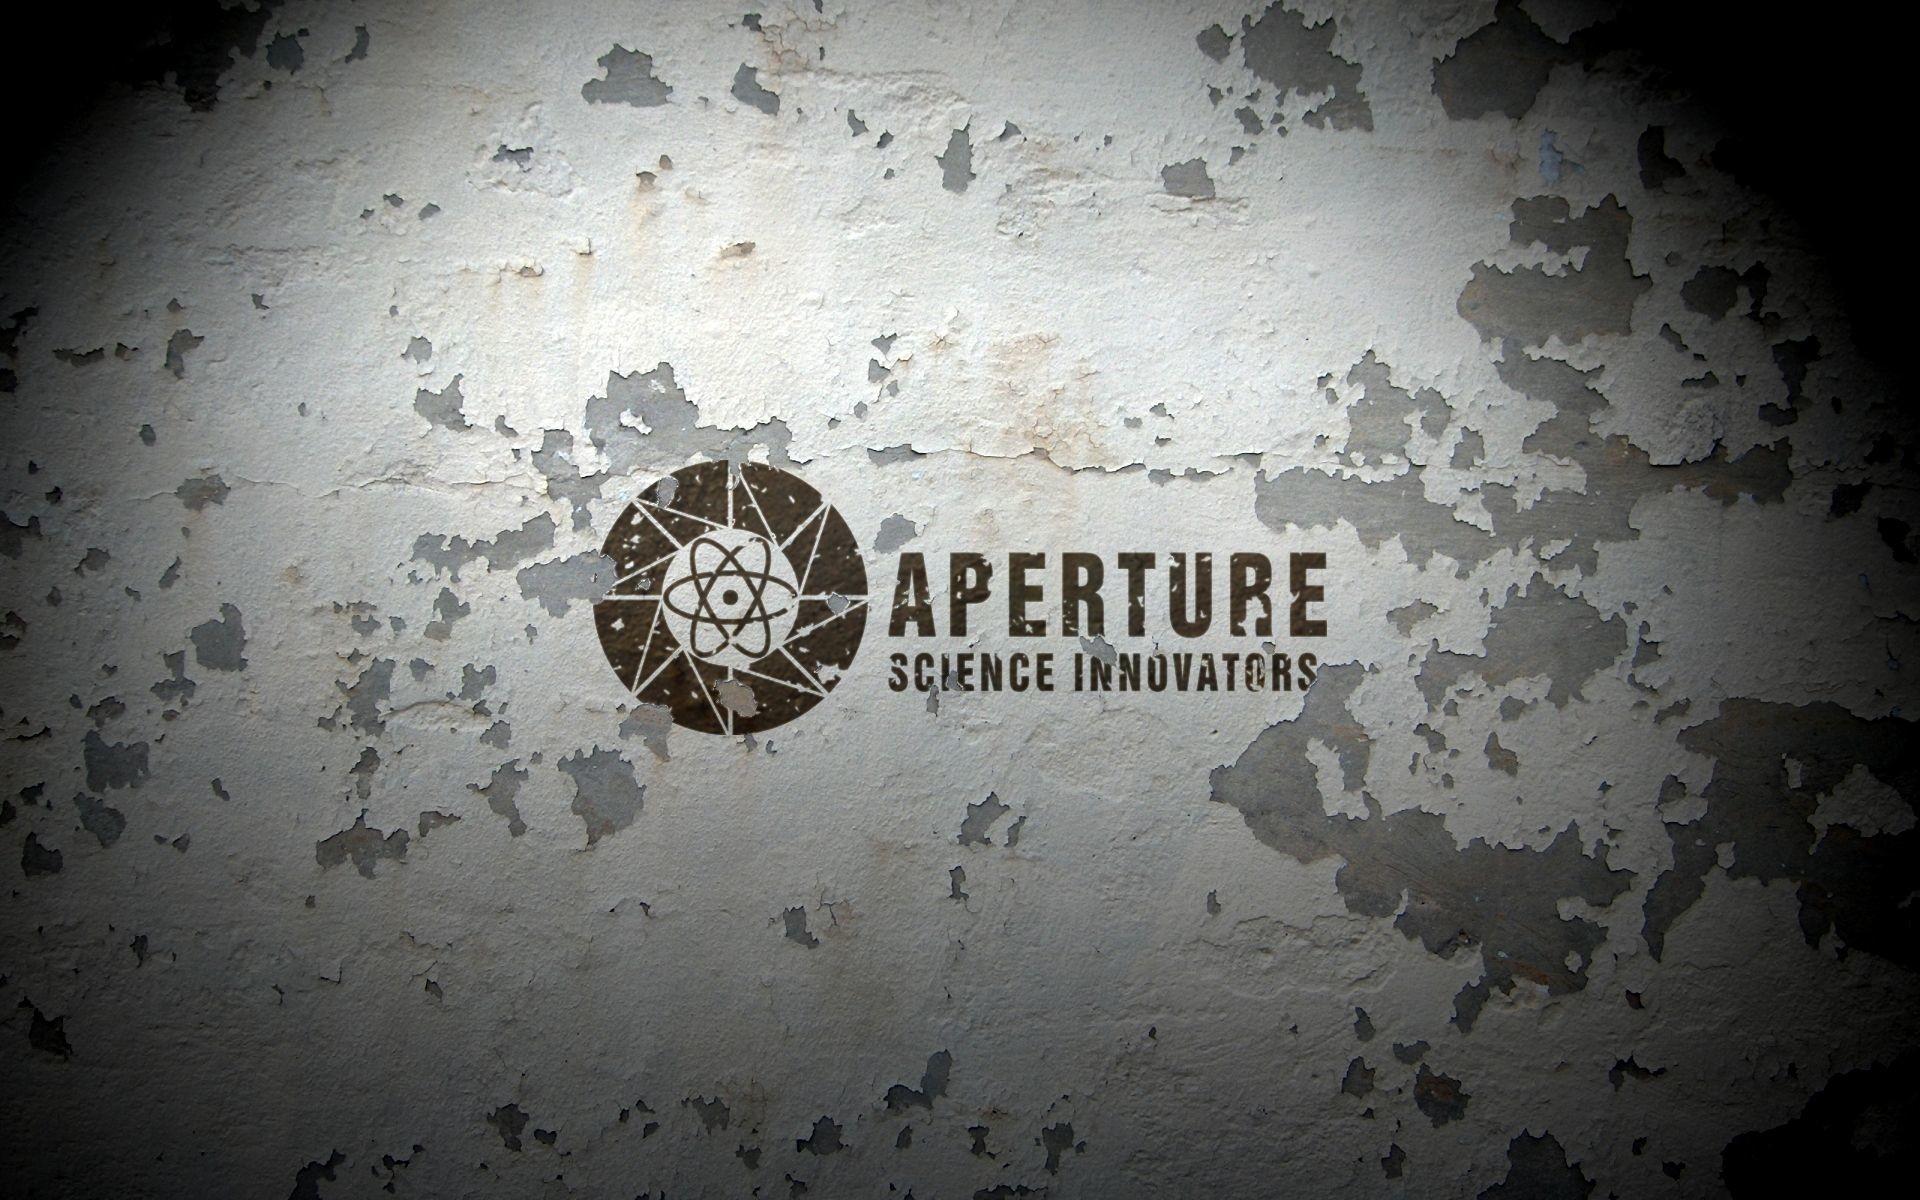 Aperture Science Wallpaper